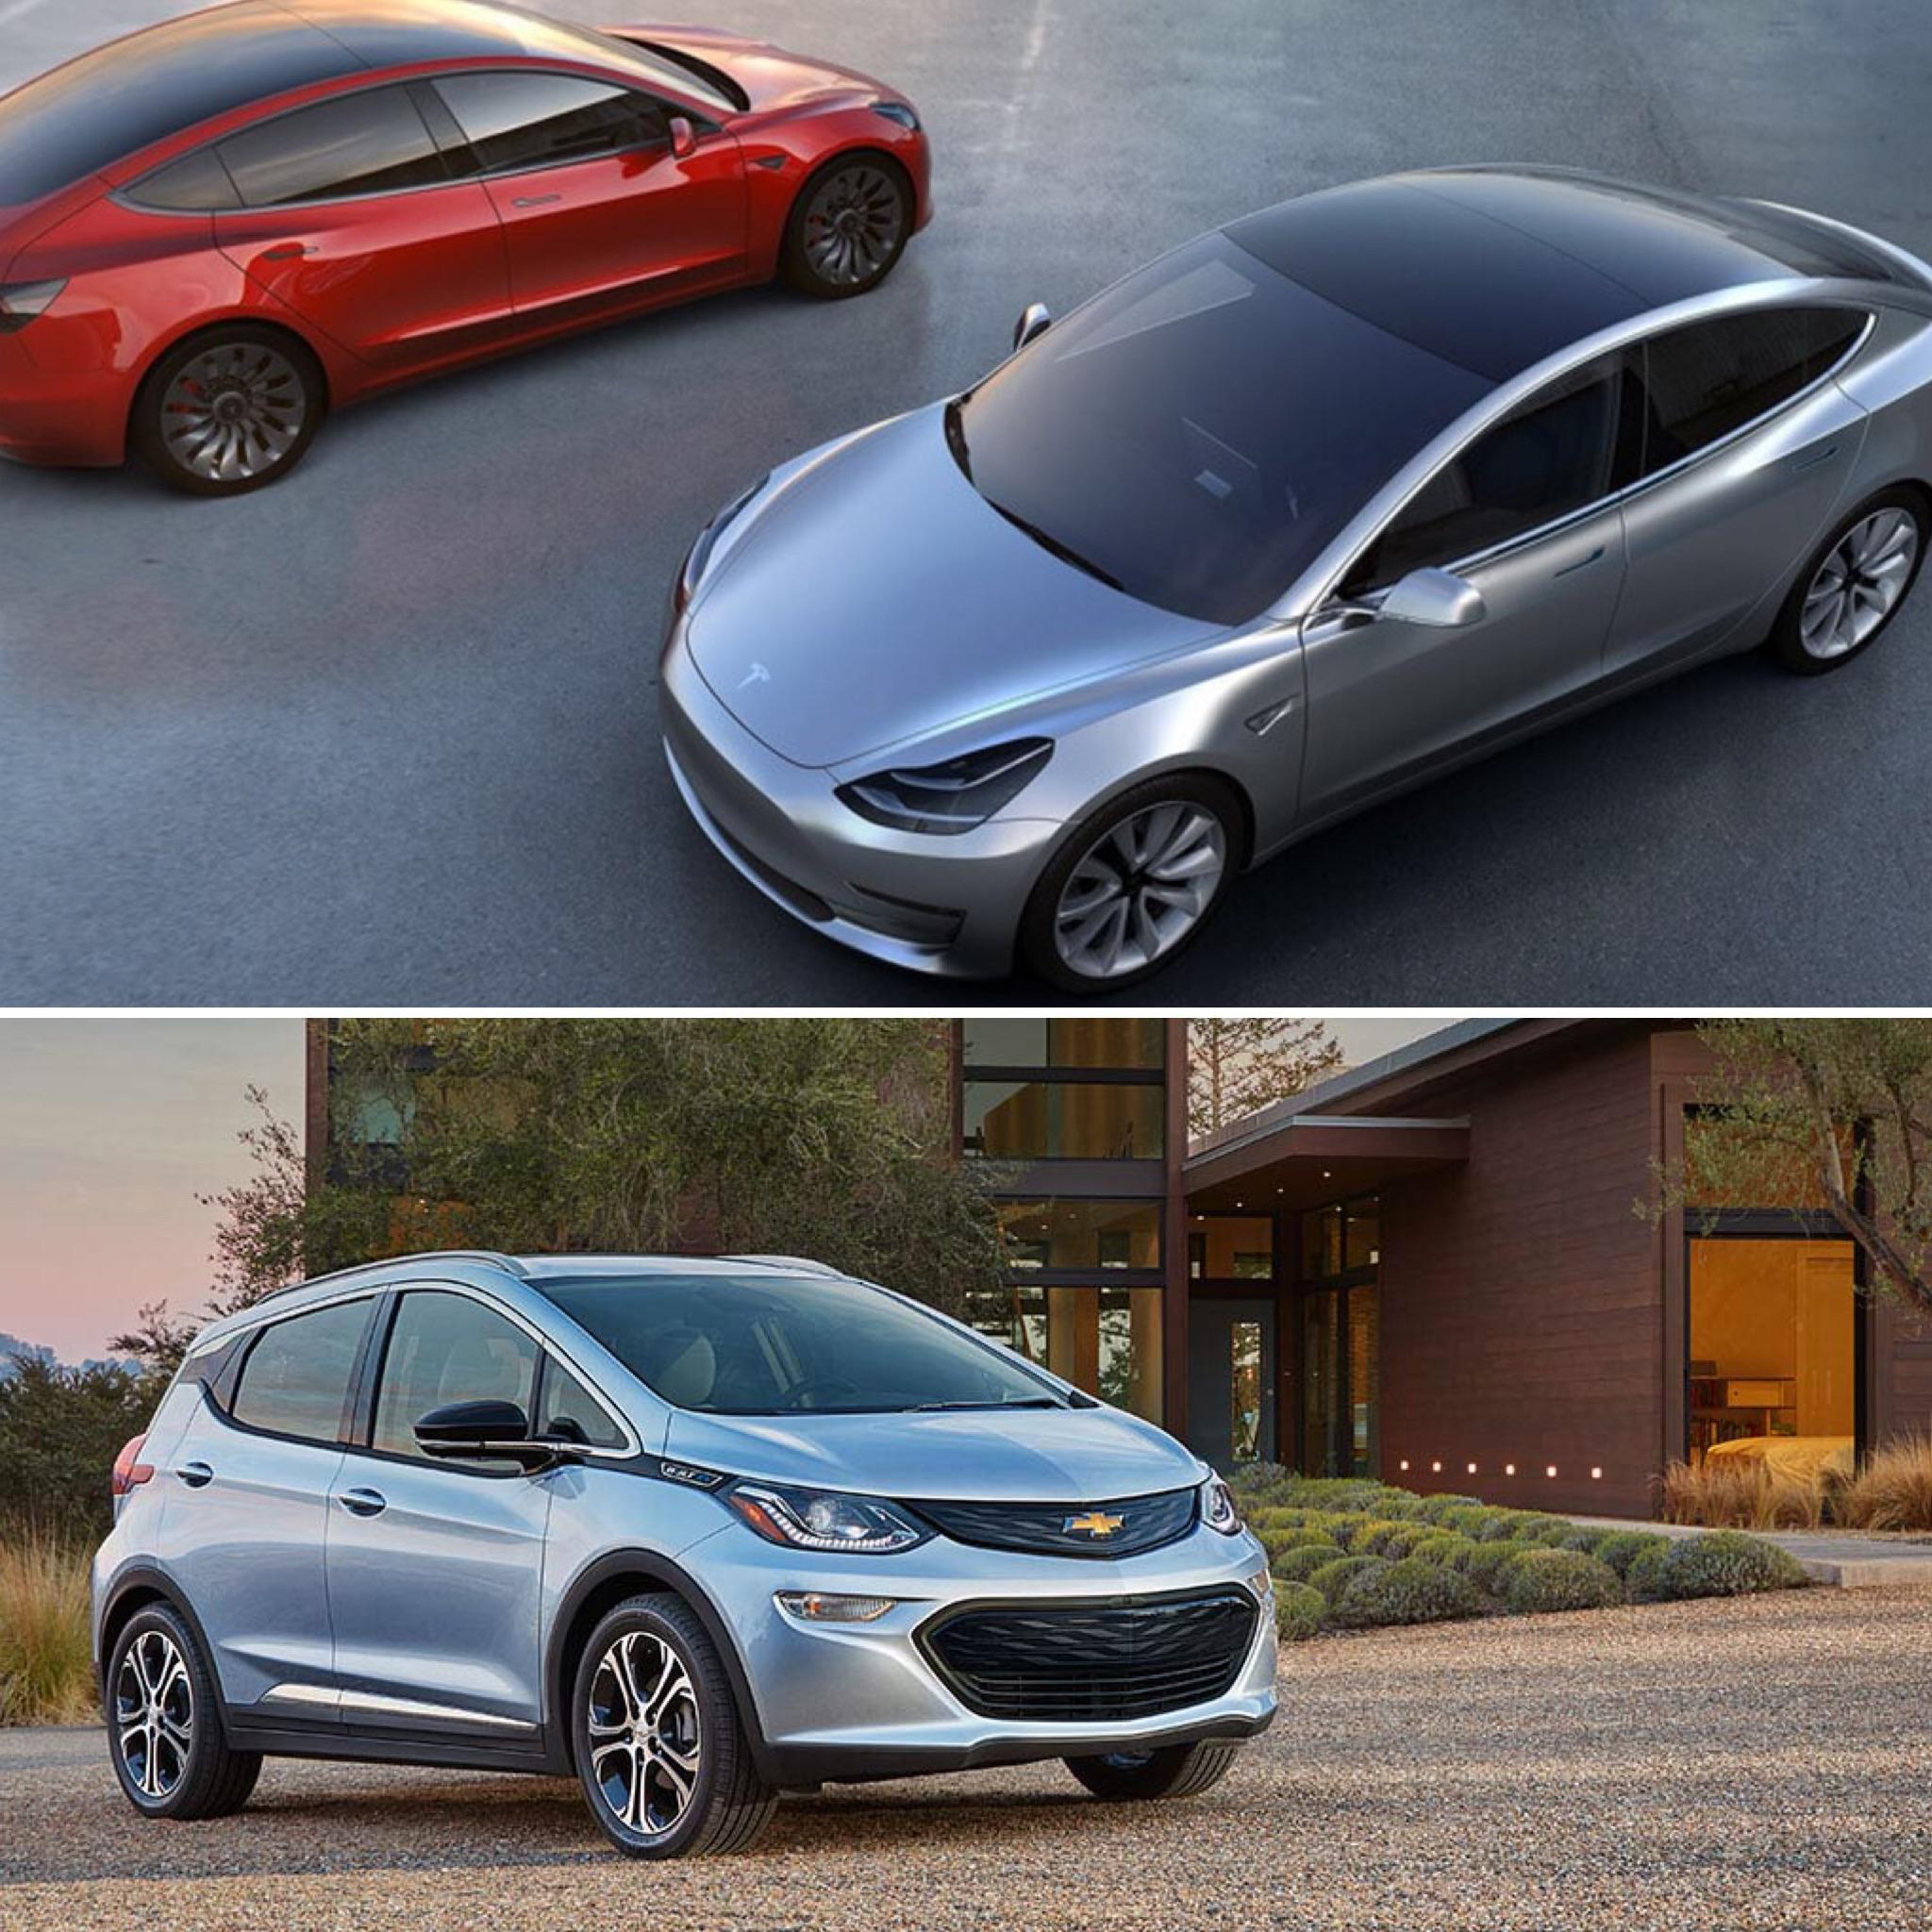 Long Range EV – Tesla Model 3 and Chevy Bolt